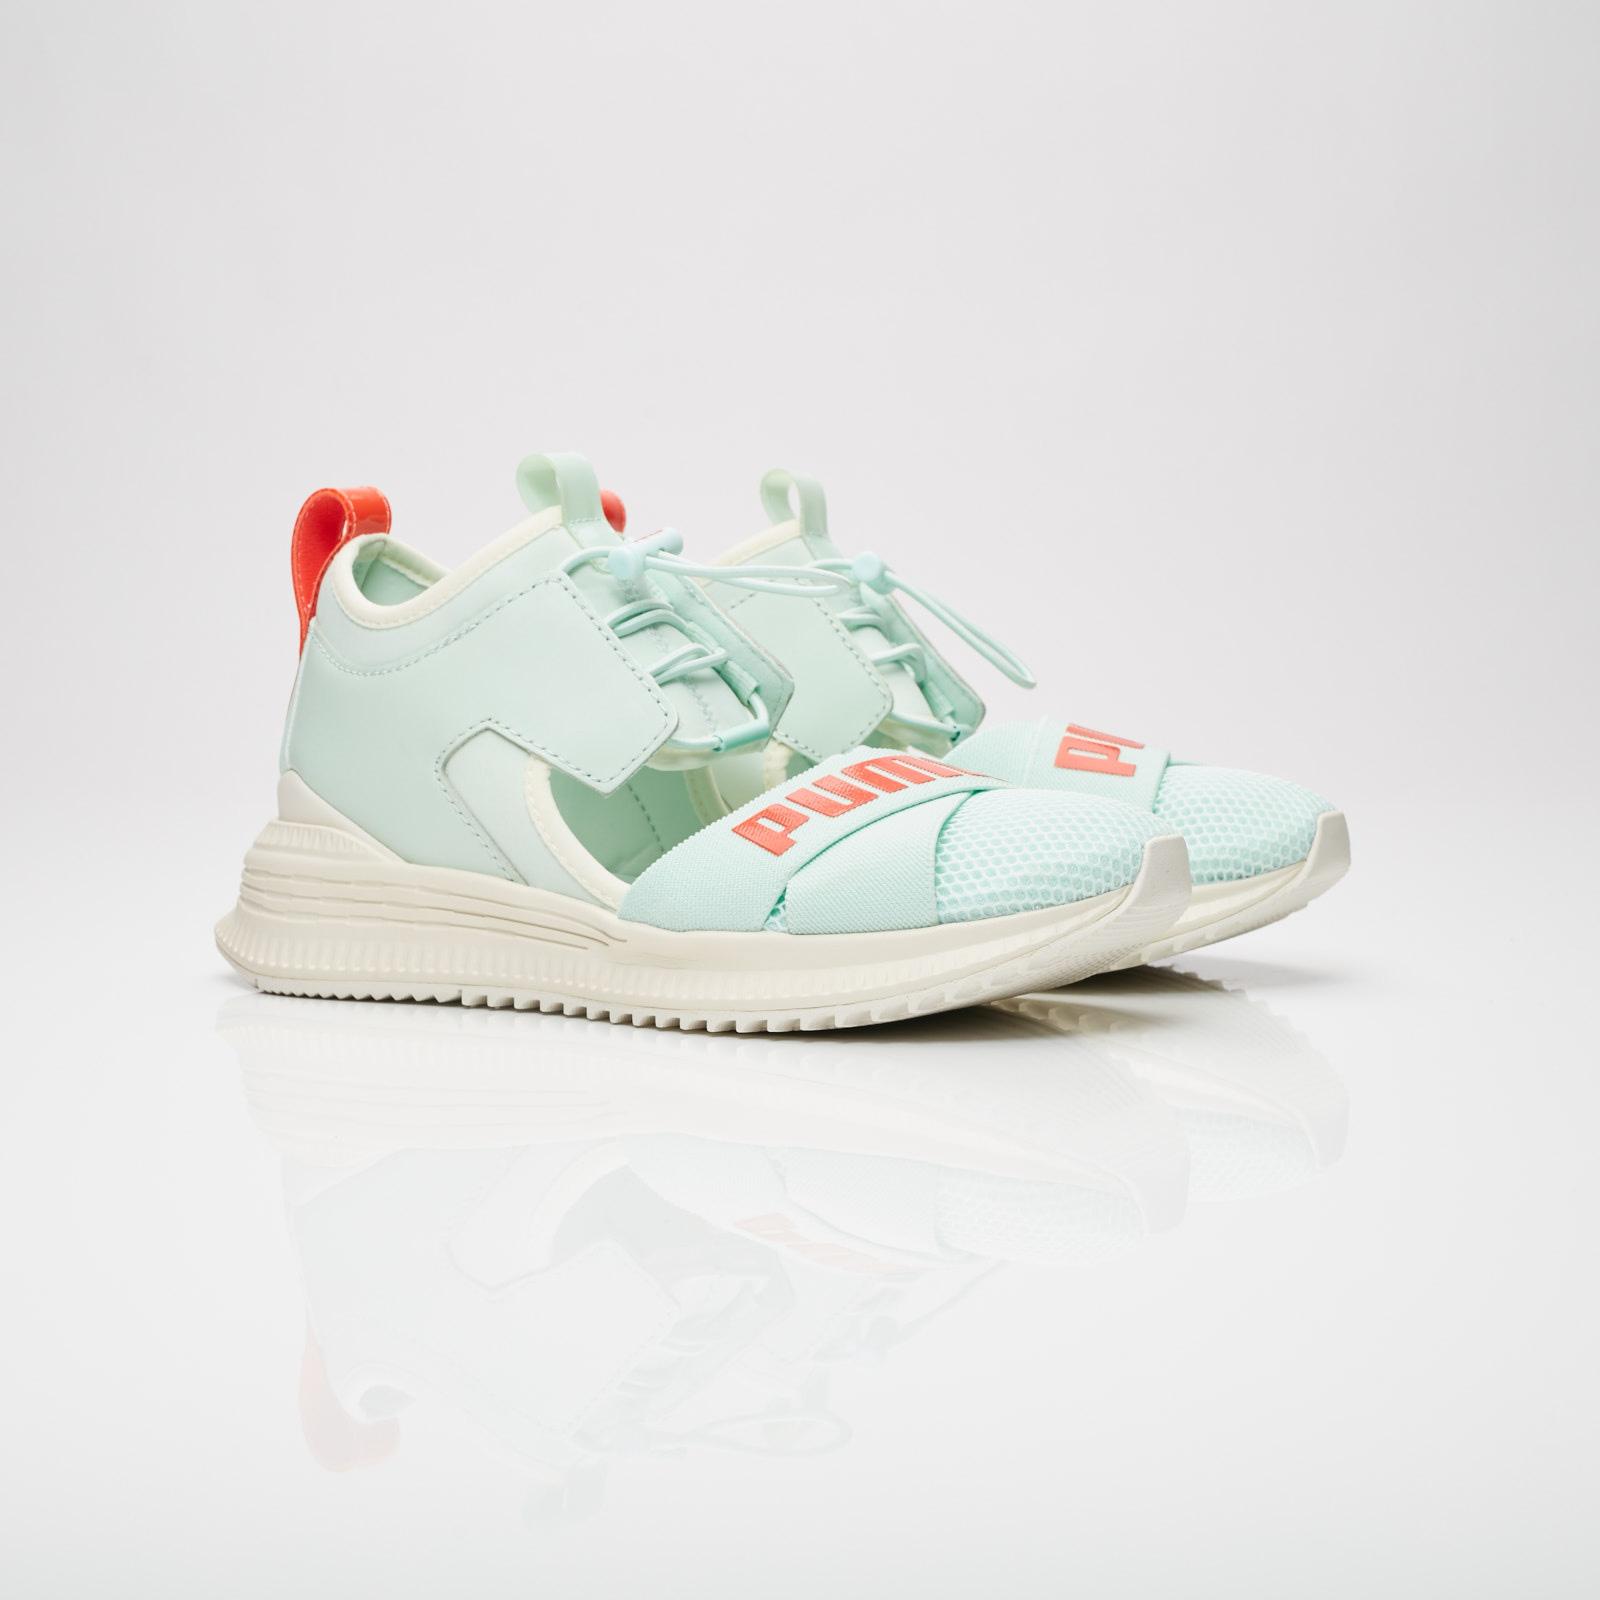 promo code c66be 8d8e3 Puma Fenty Avid Wns - 367683-05 - Sneakersnstuff | sneakers ...